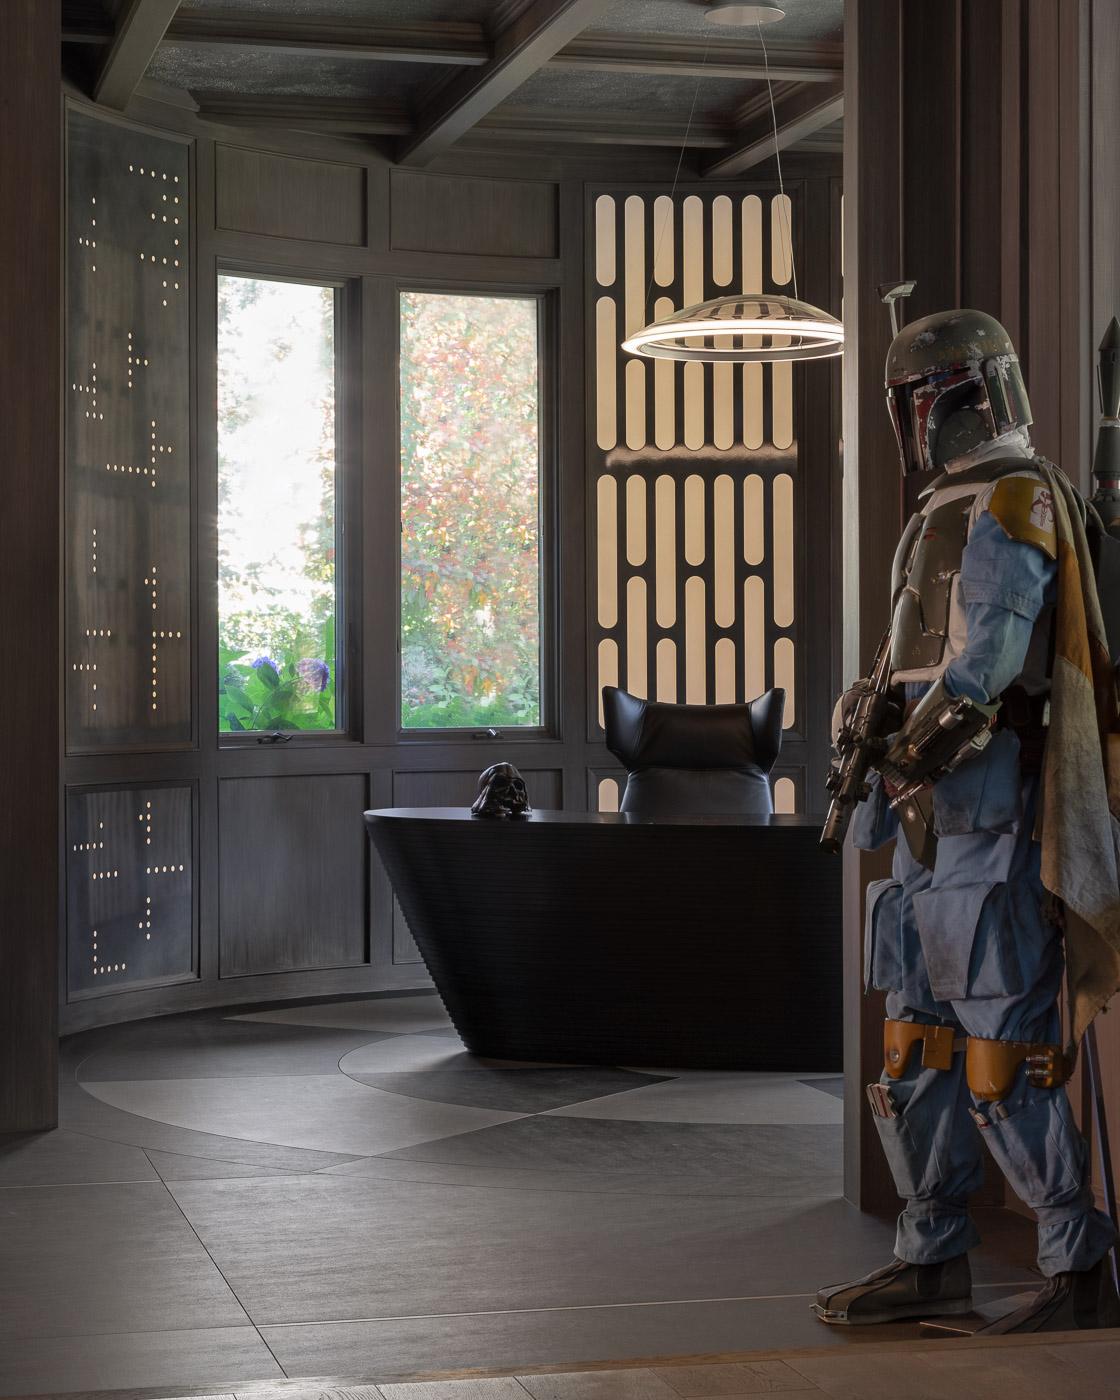 Star Wars Home Office - Boba Fett